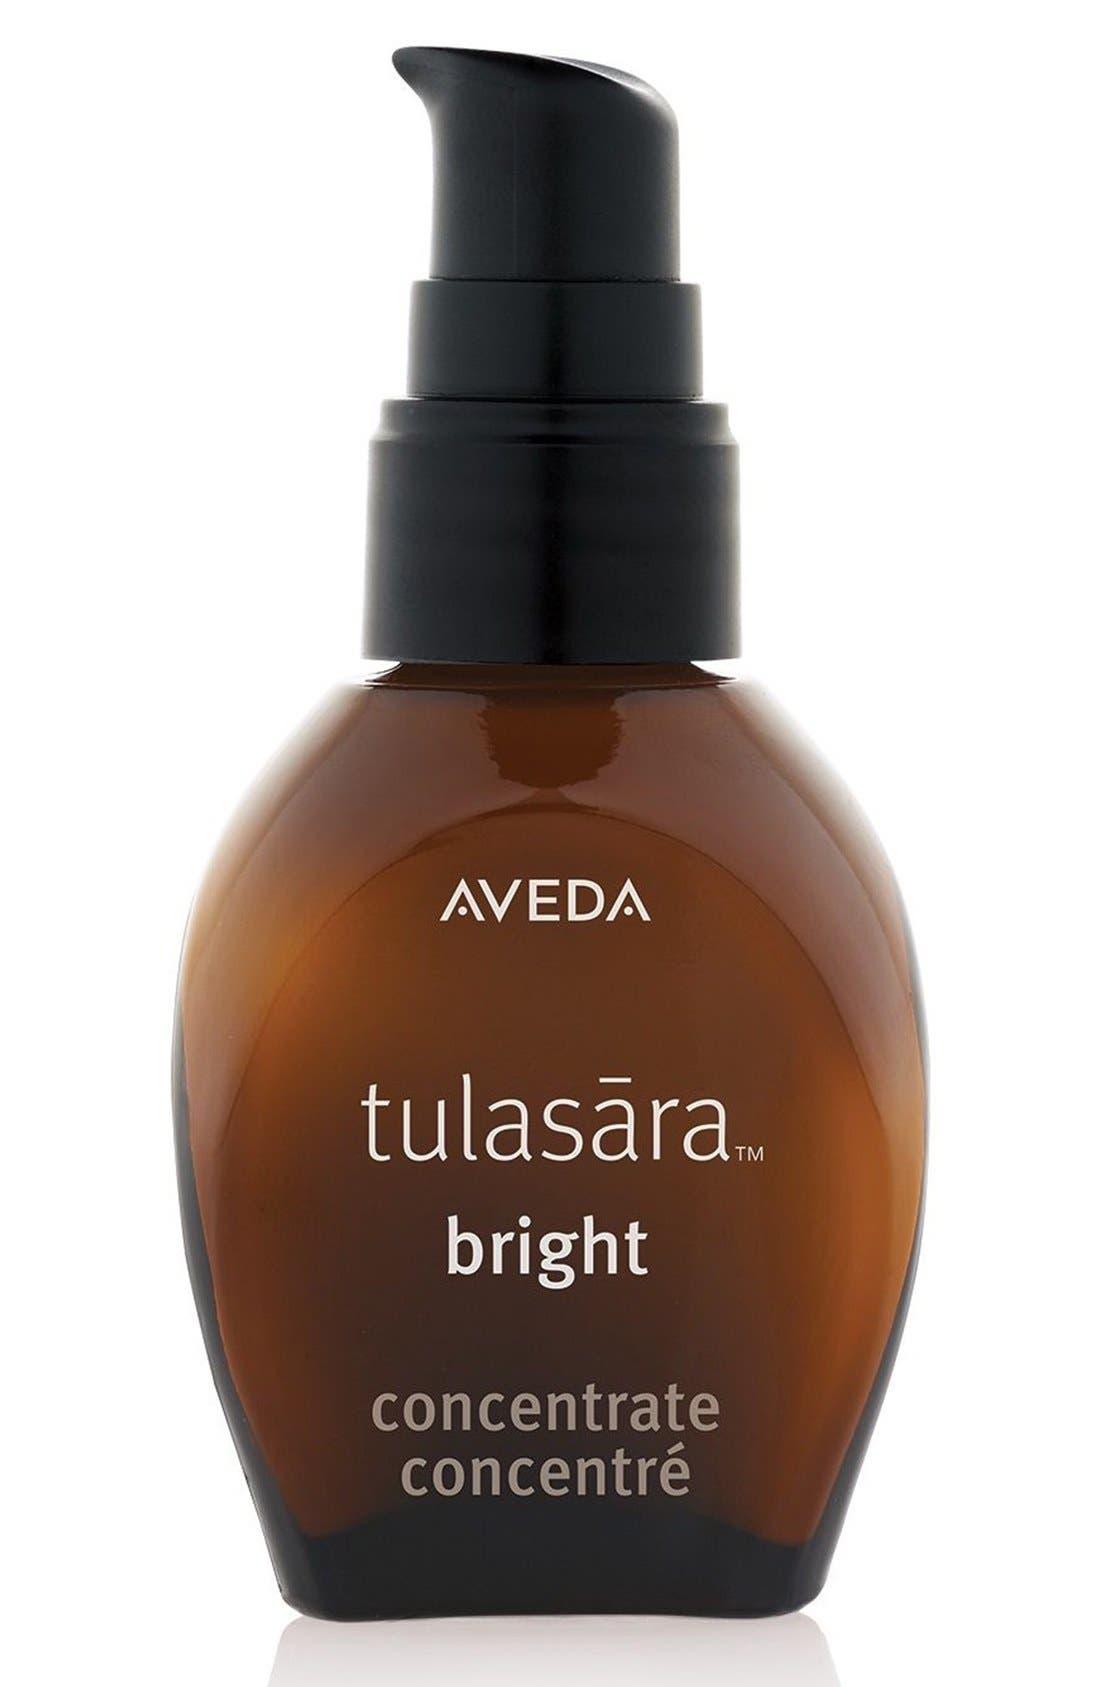 Aveda 'tulasara™ bright' Concentrate